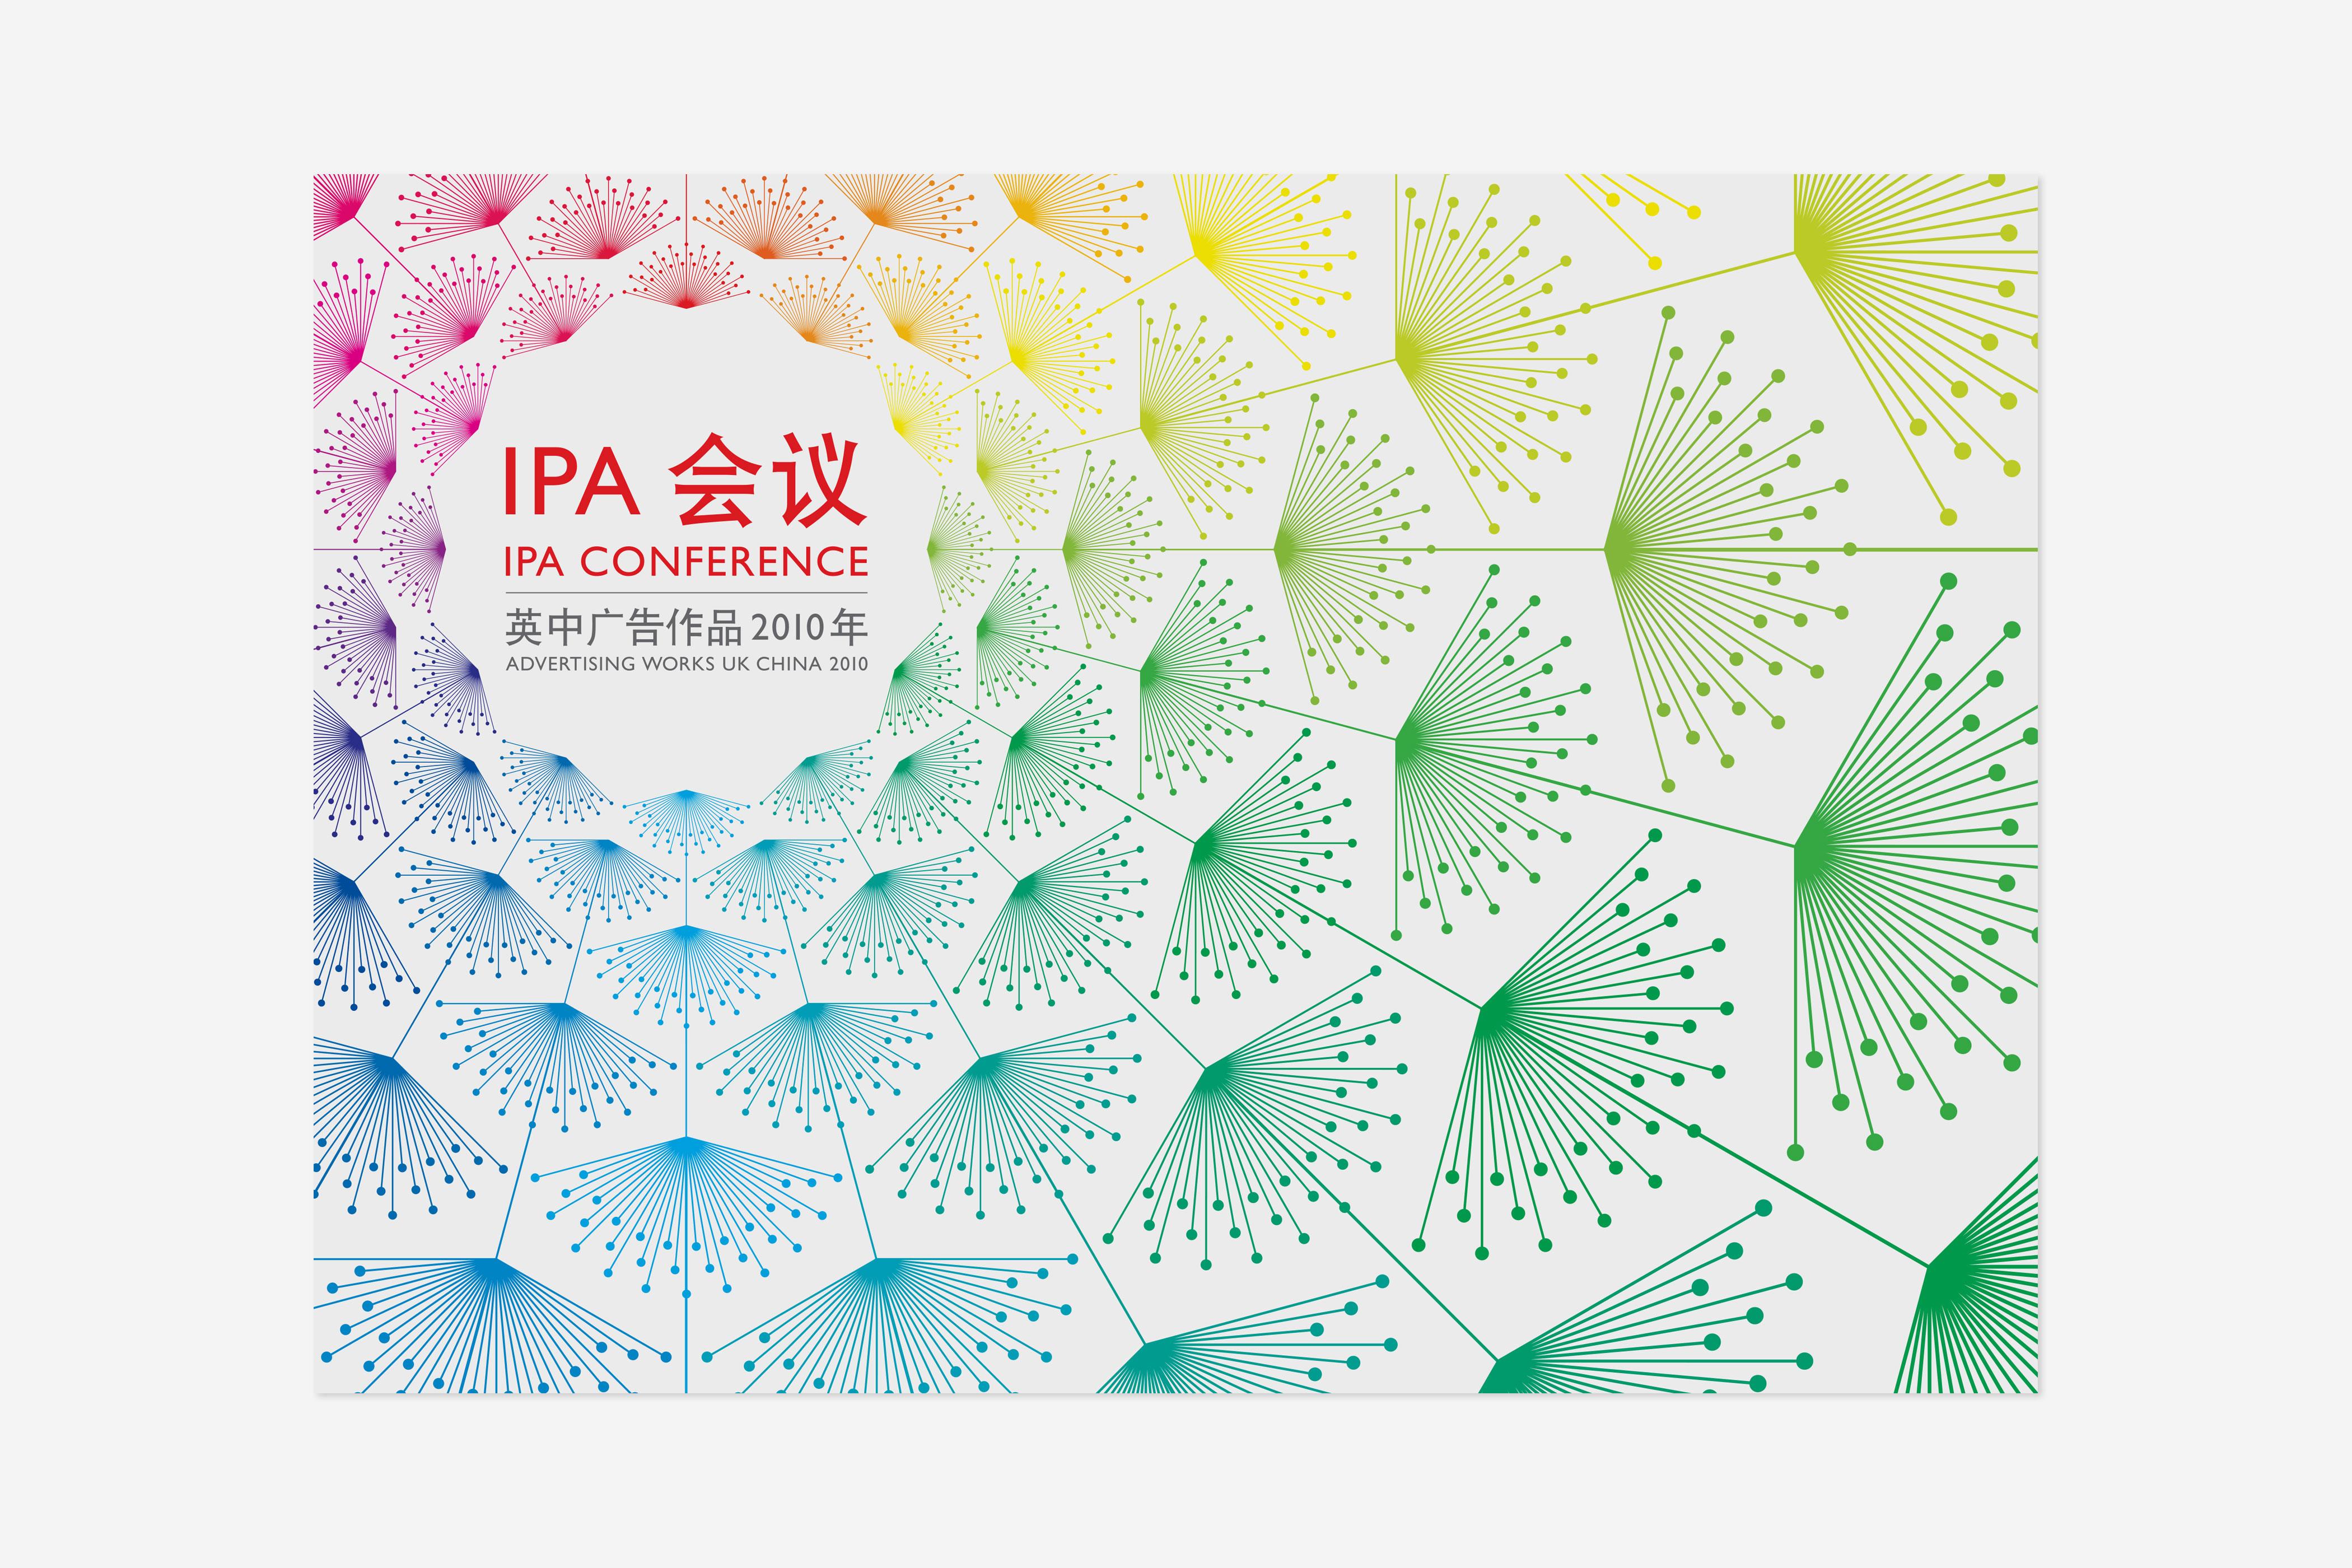 IPA_advertising-works-invitation